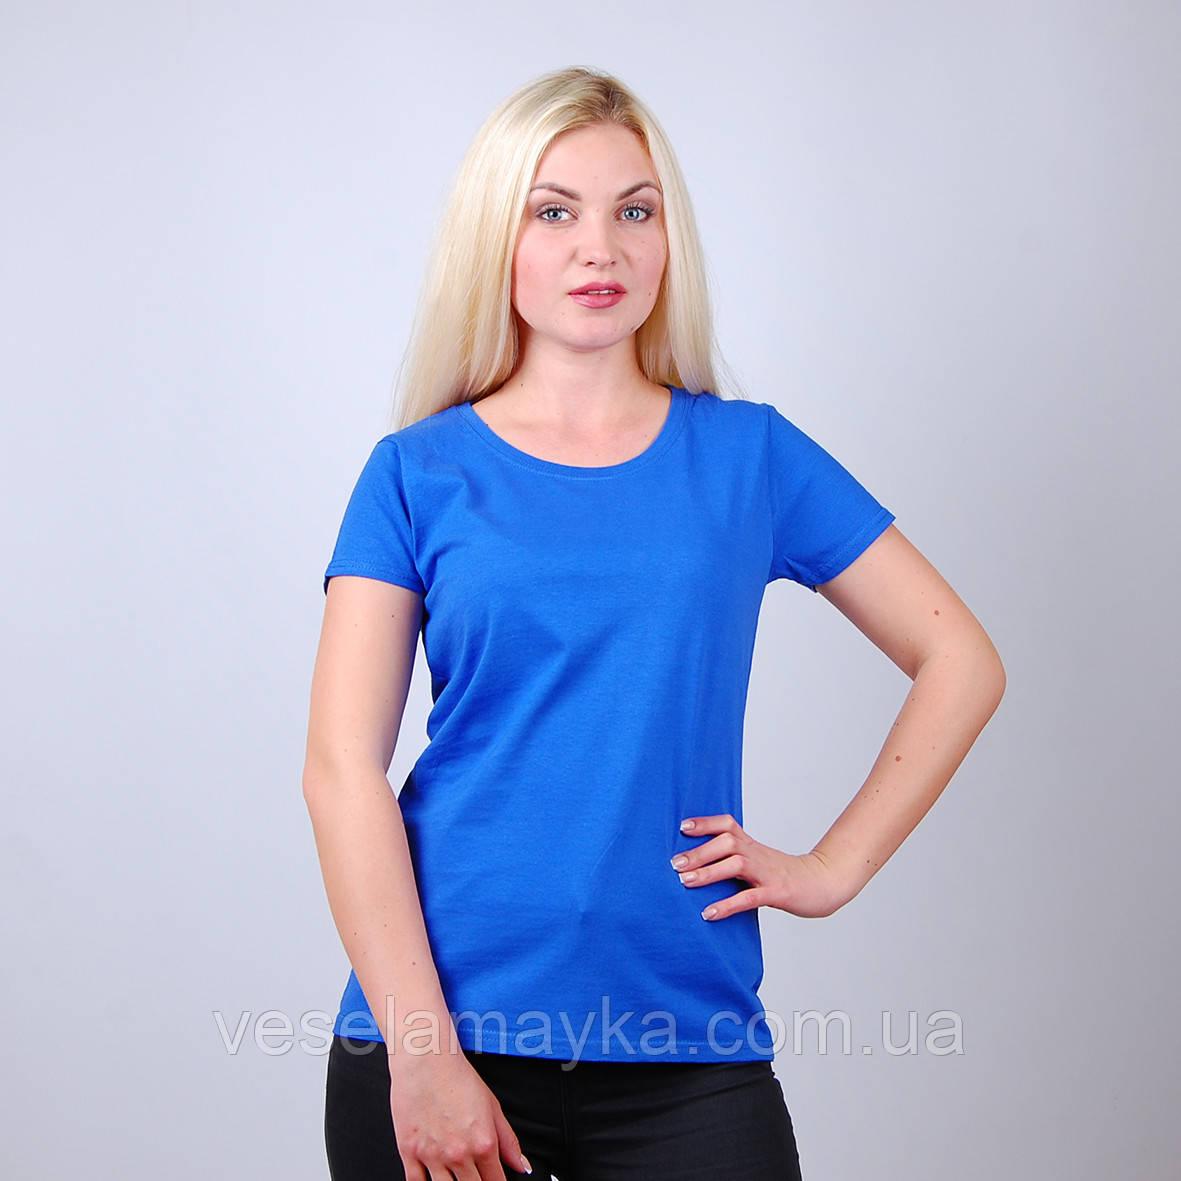 Синяя женская футболка (Комфорт)